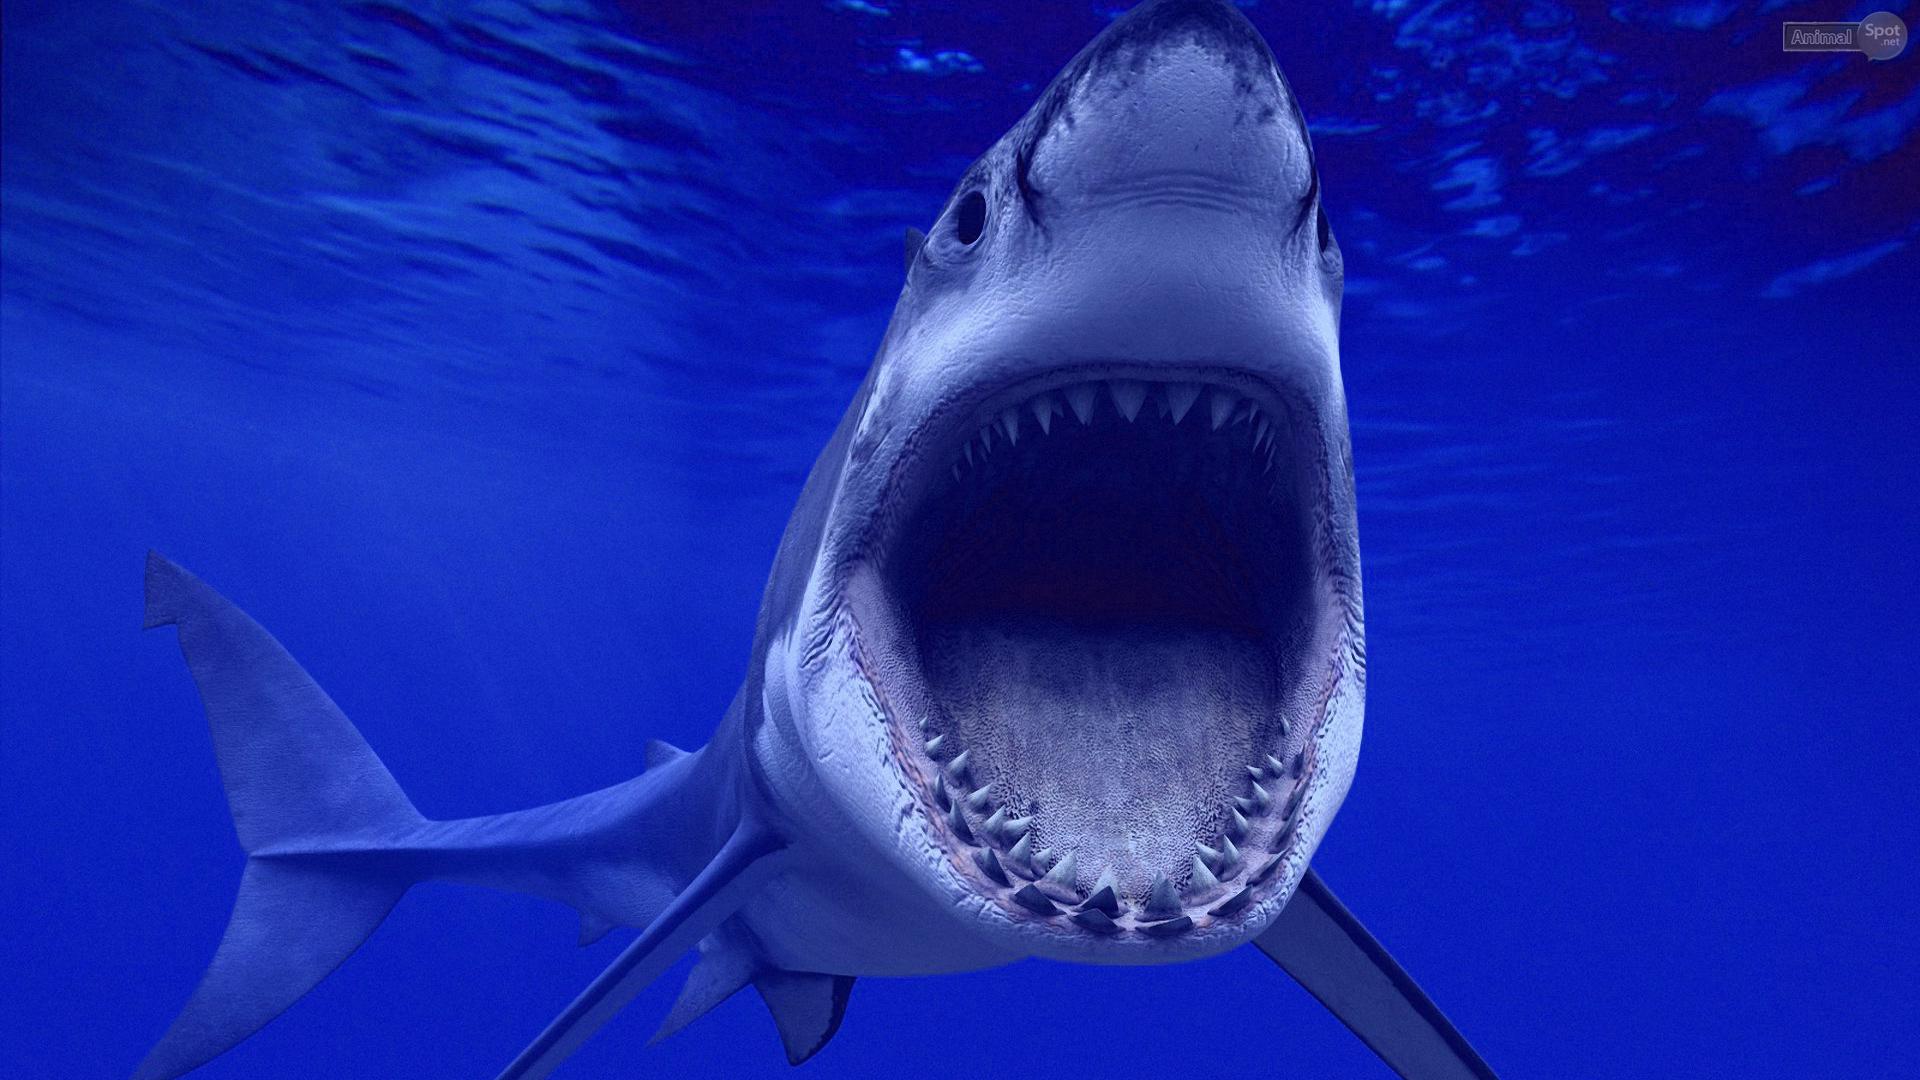 47 Free Great White Shark Wallpaper On Wallpapersafari